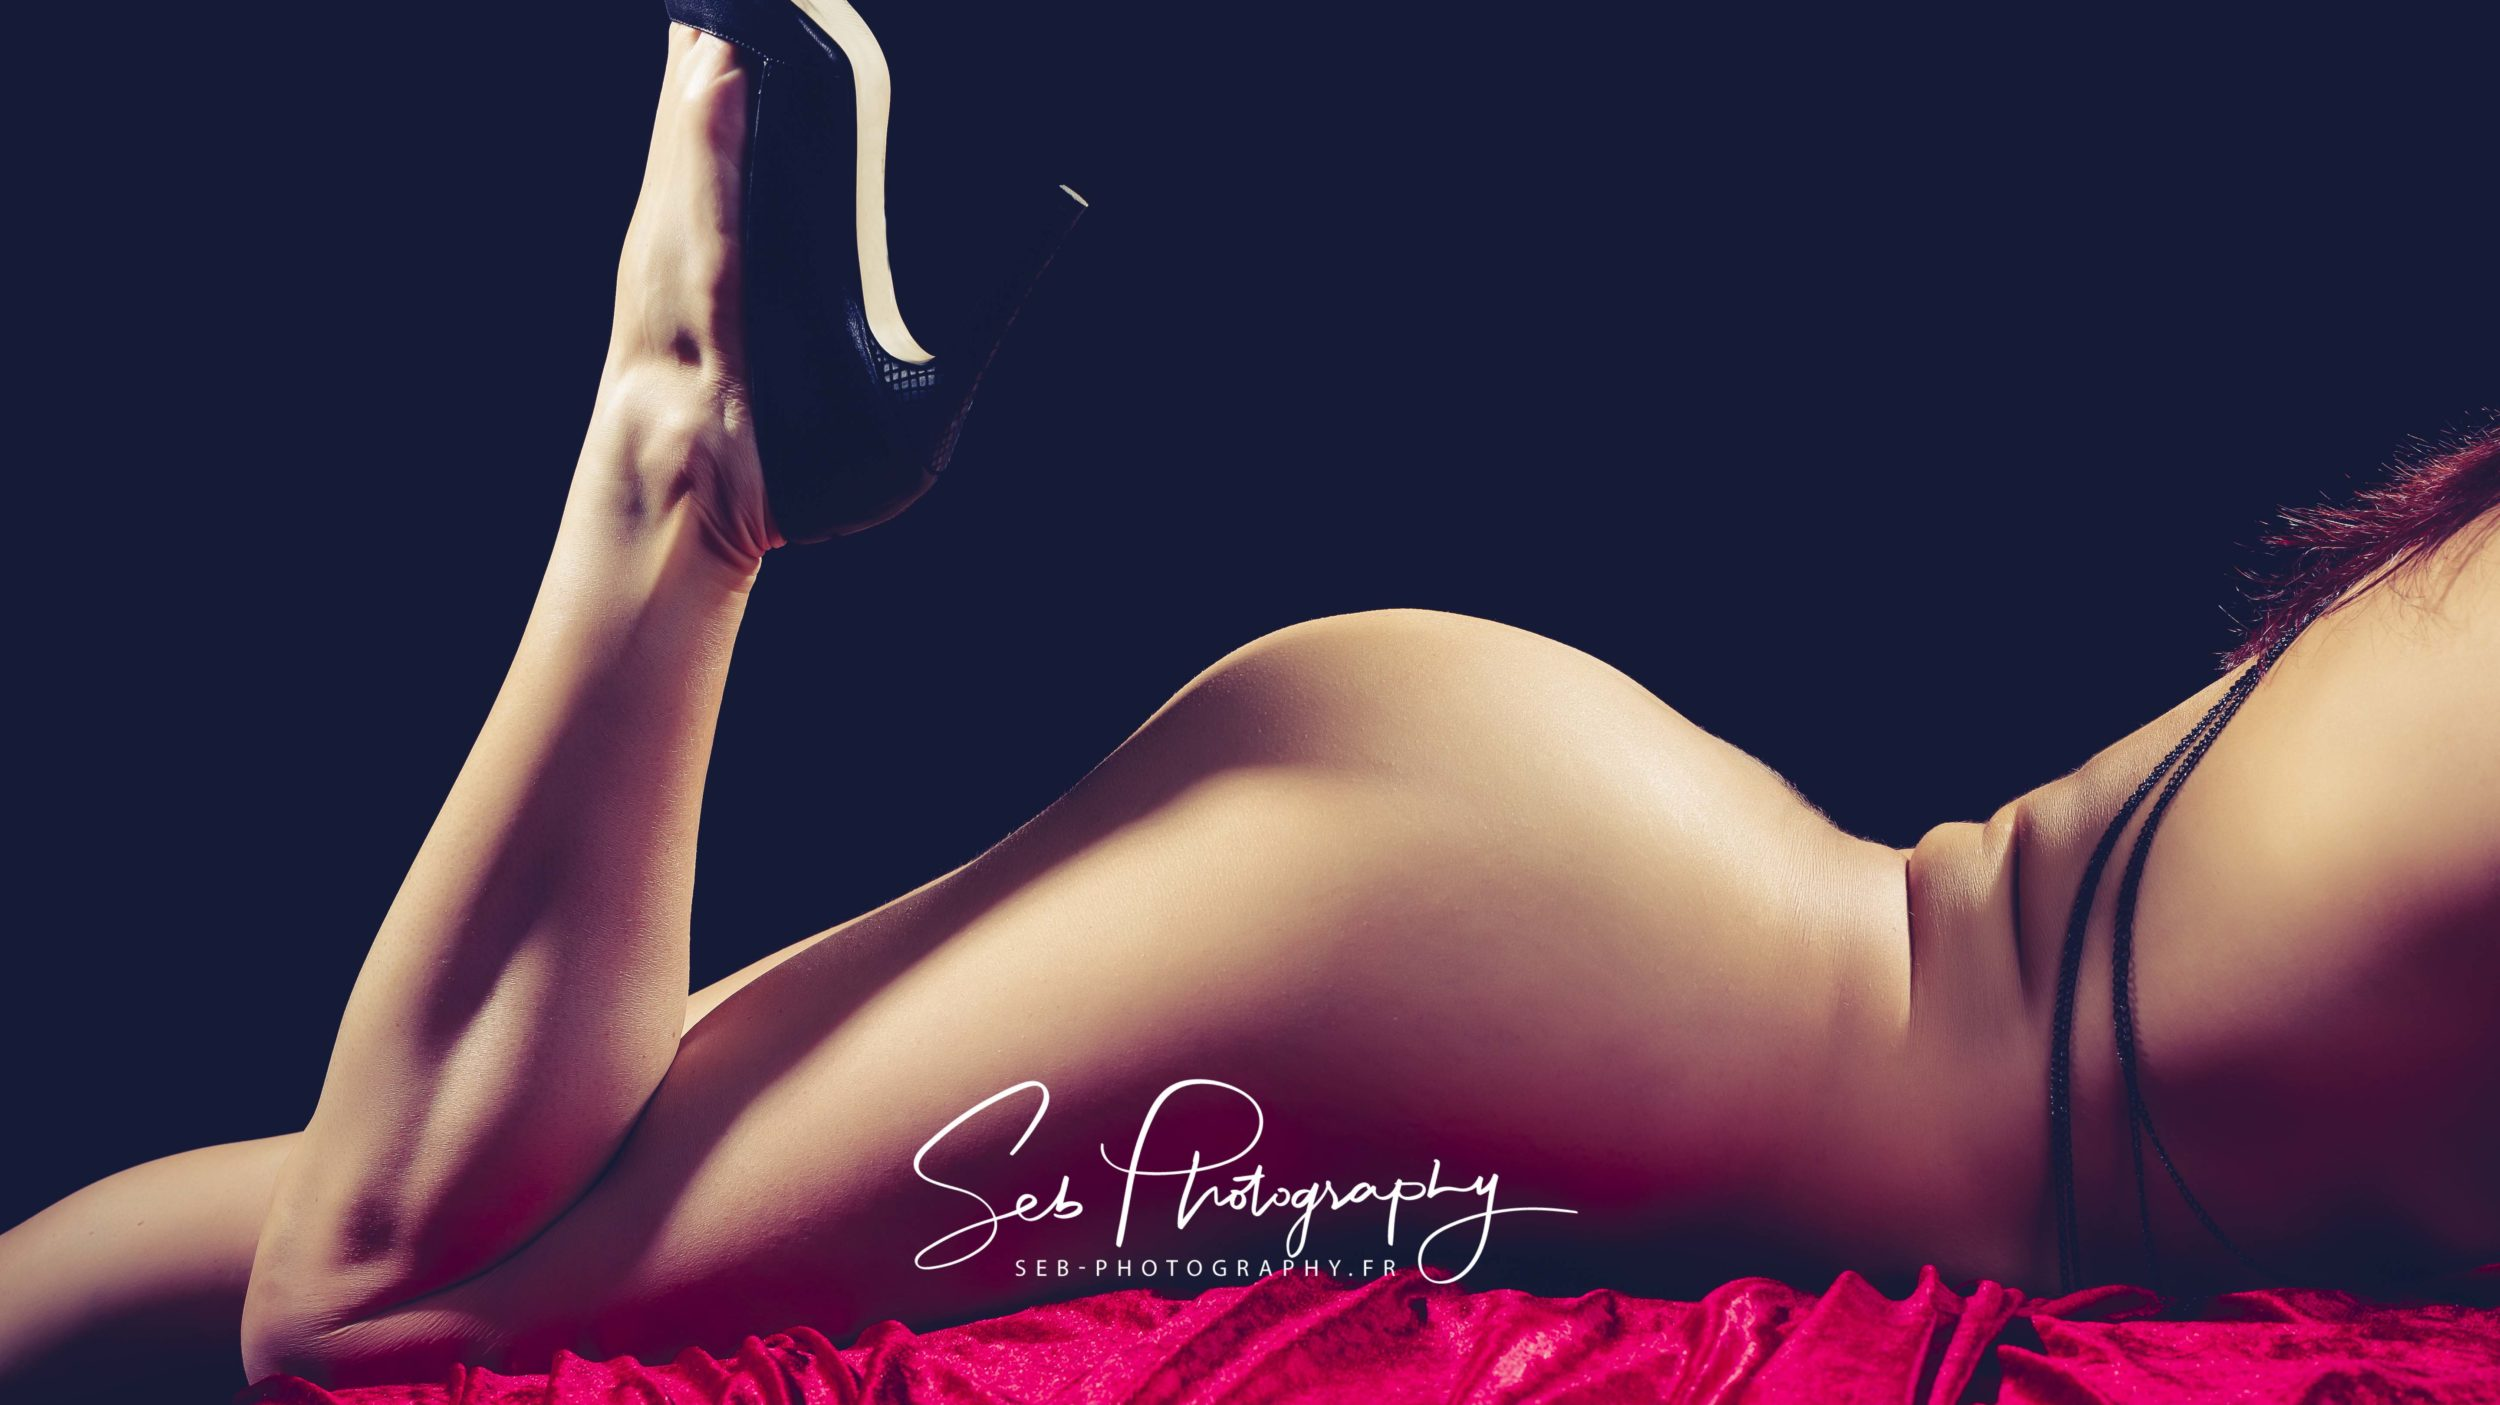 Seb Photography